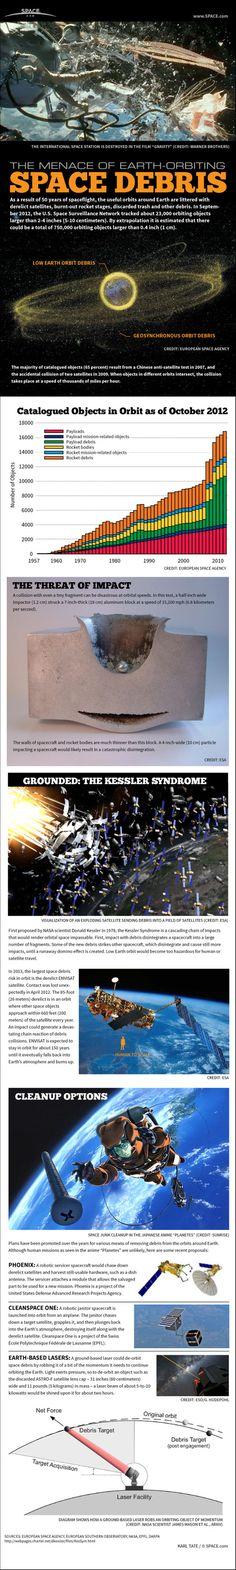 Space Junk Explained: How Orbital Debris Threatens Future of Spaceflight (Infographic)